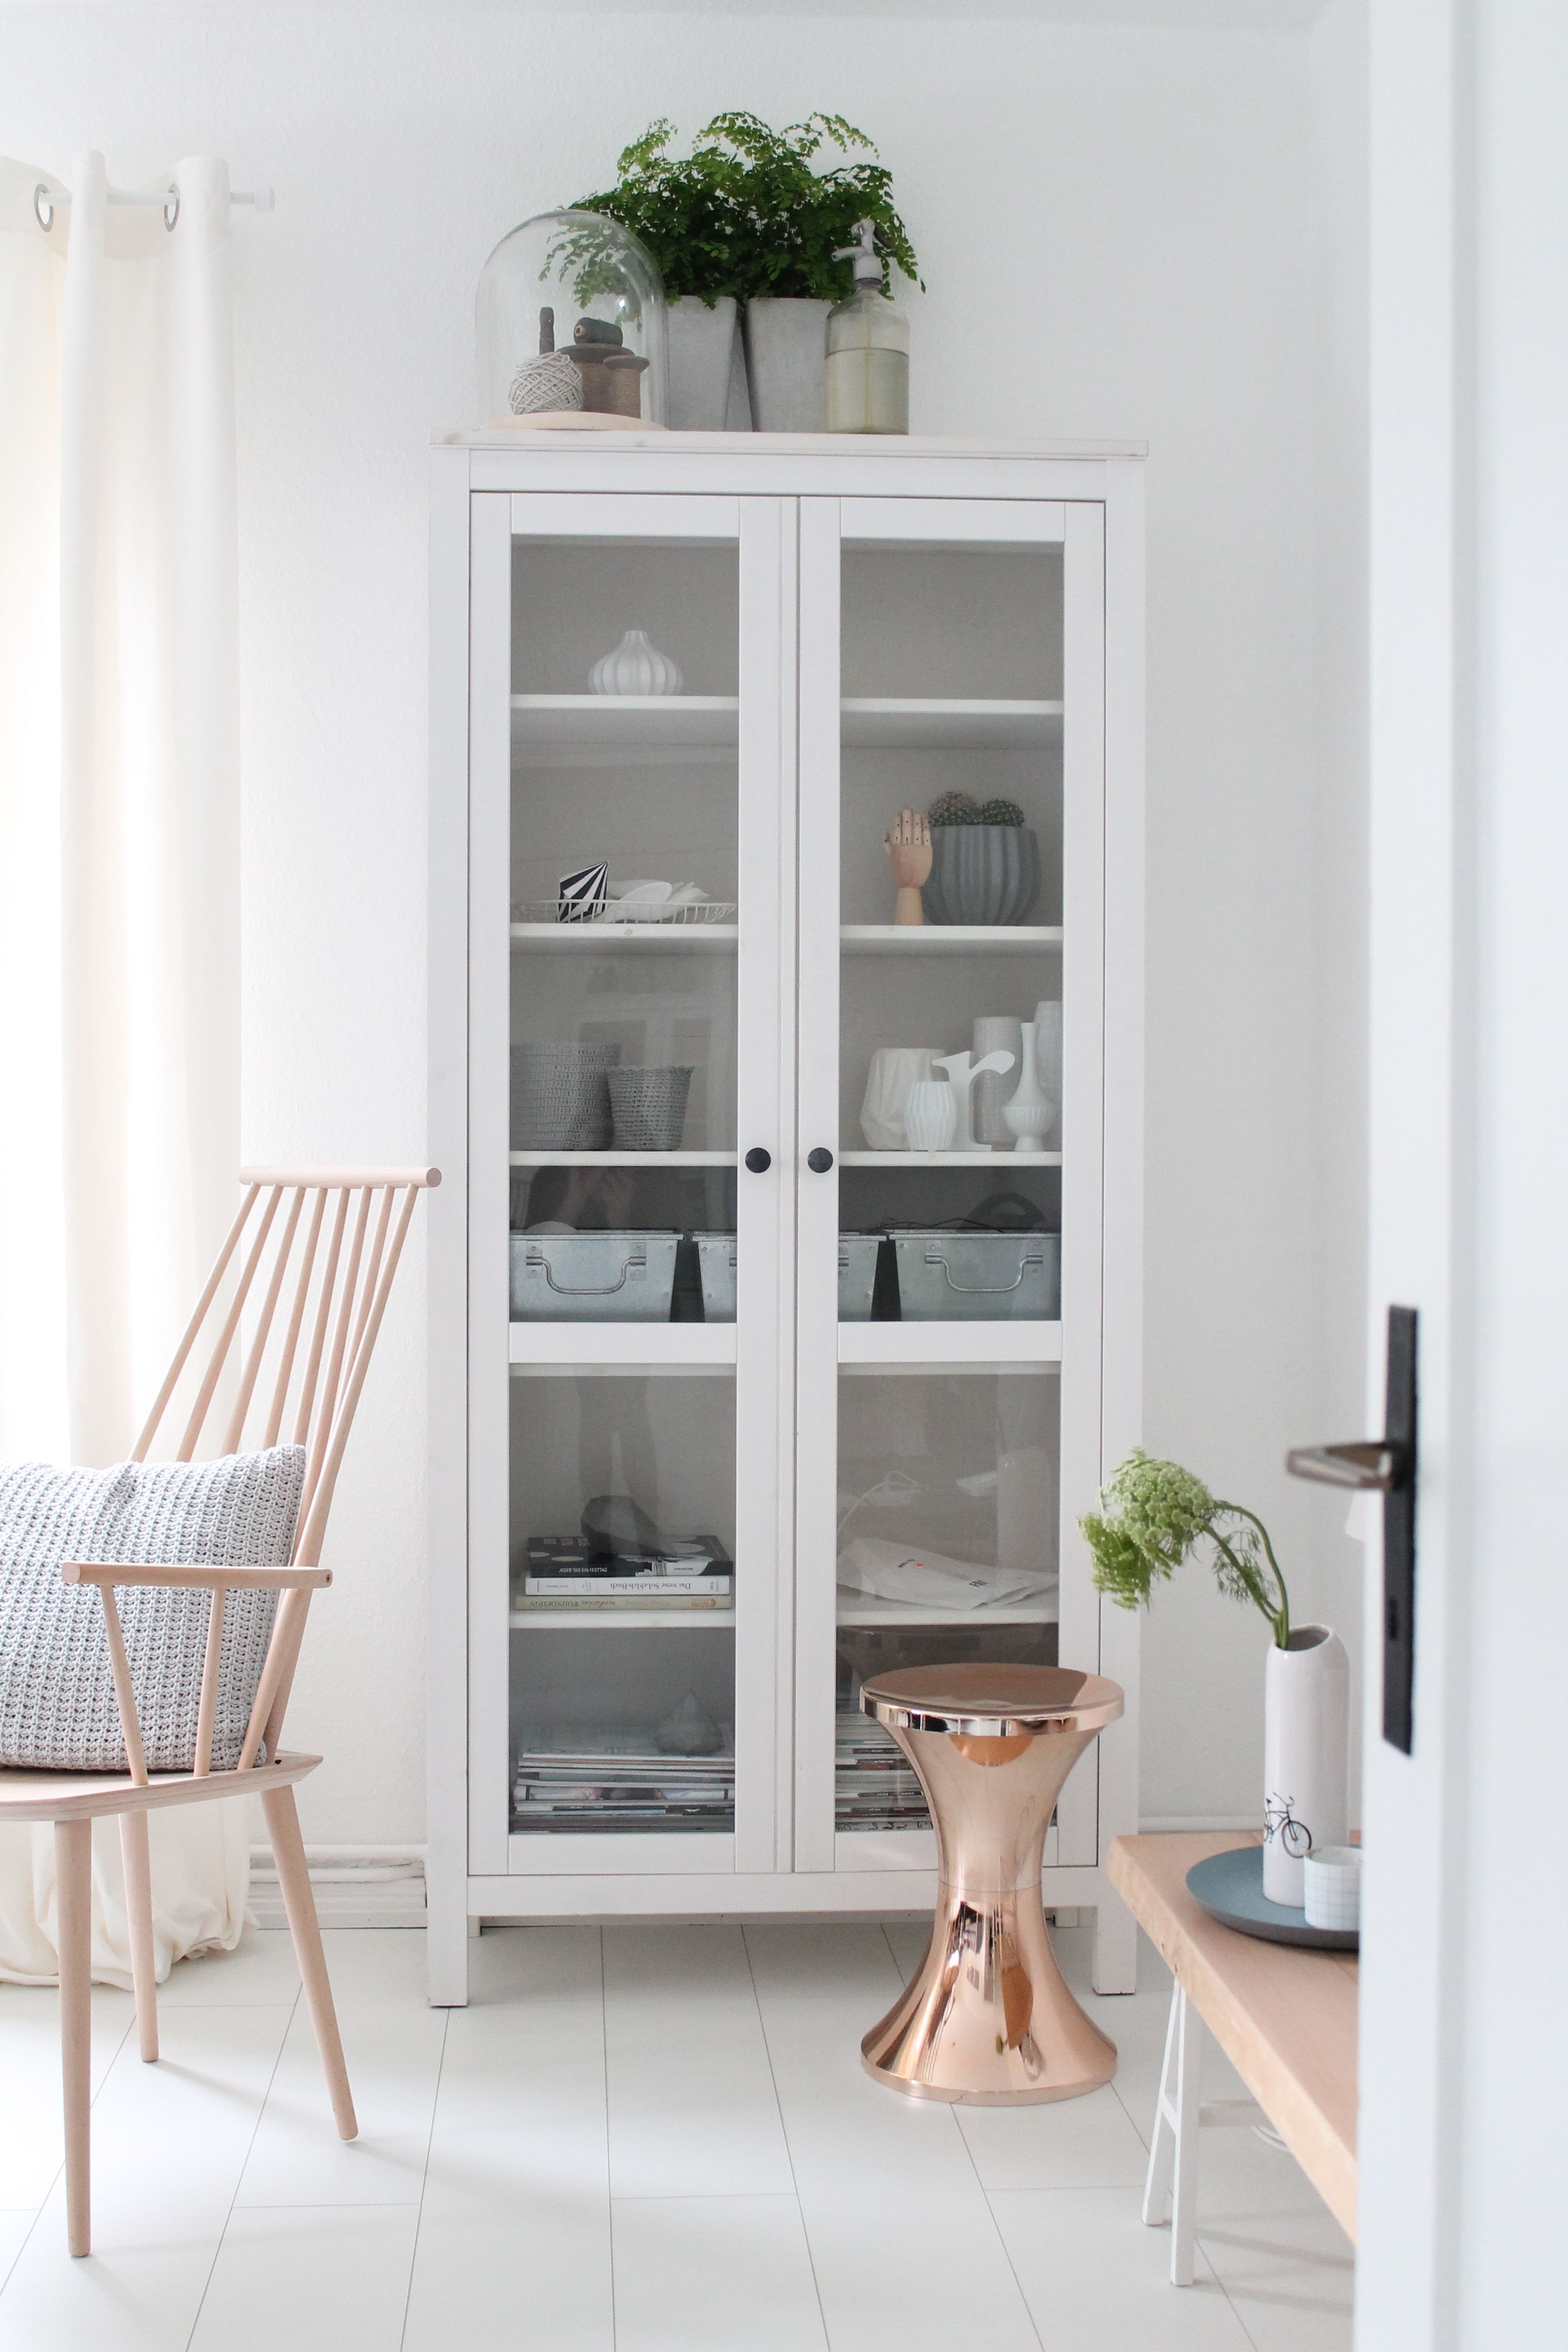 Ikea U0027Hemnesu0027 Display Cabinet U0026 Copper U0027TomTomu0027 Stool